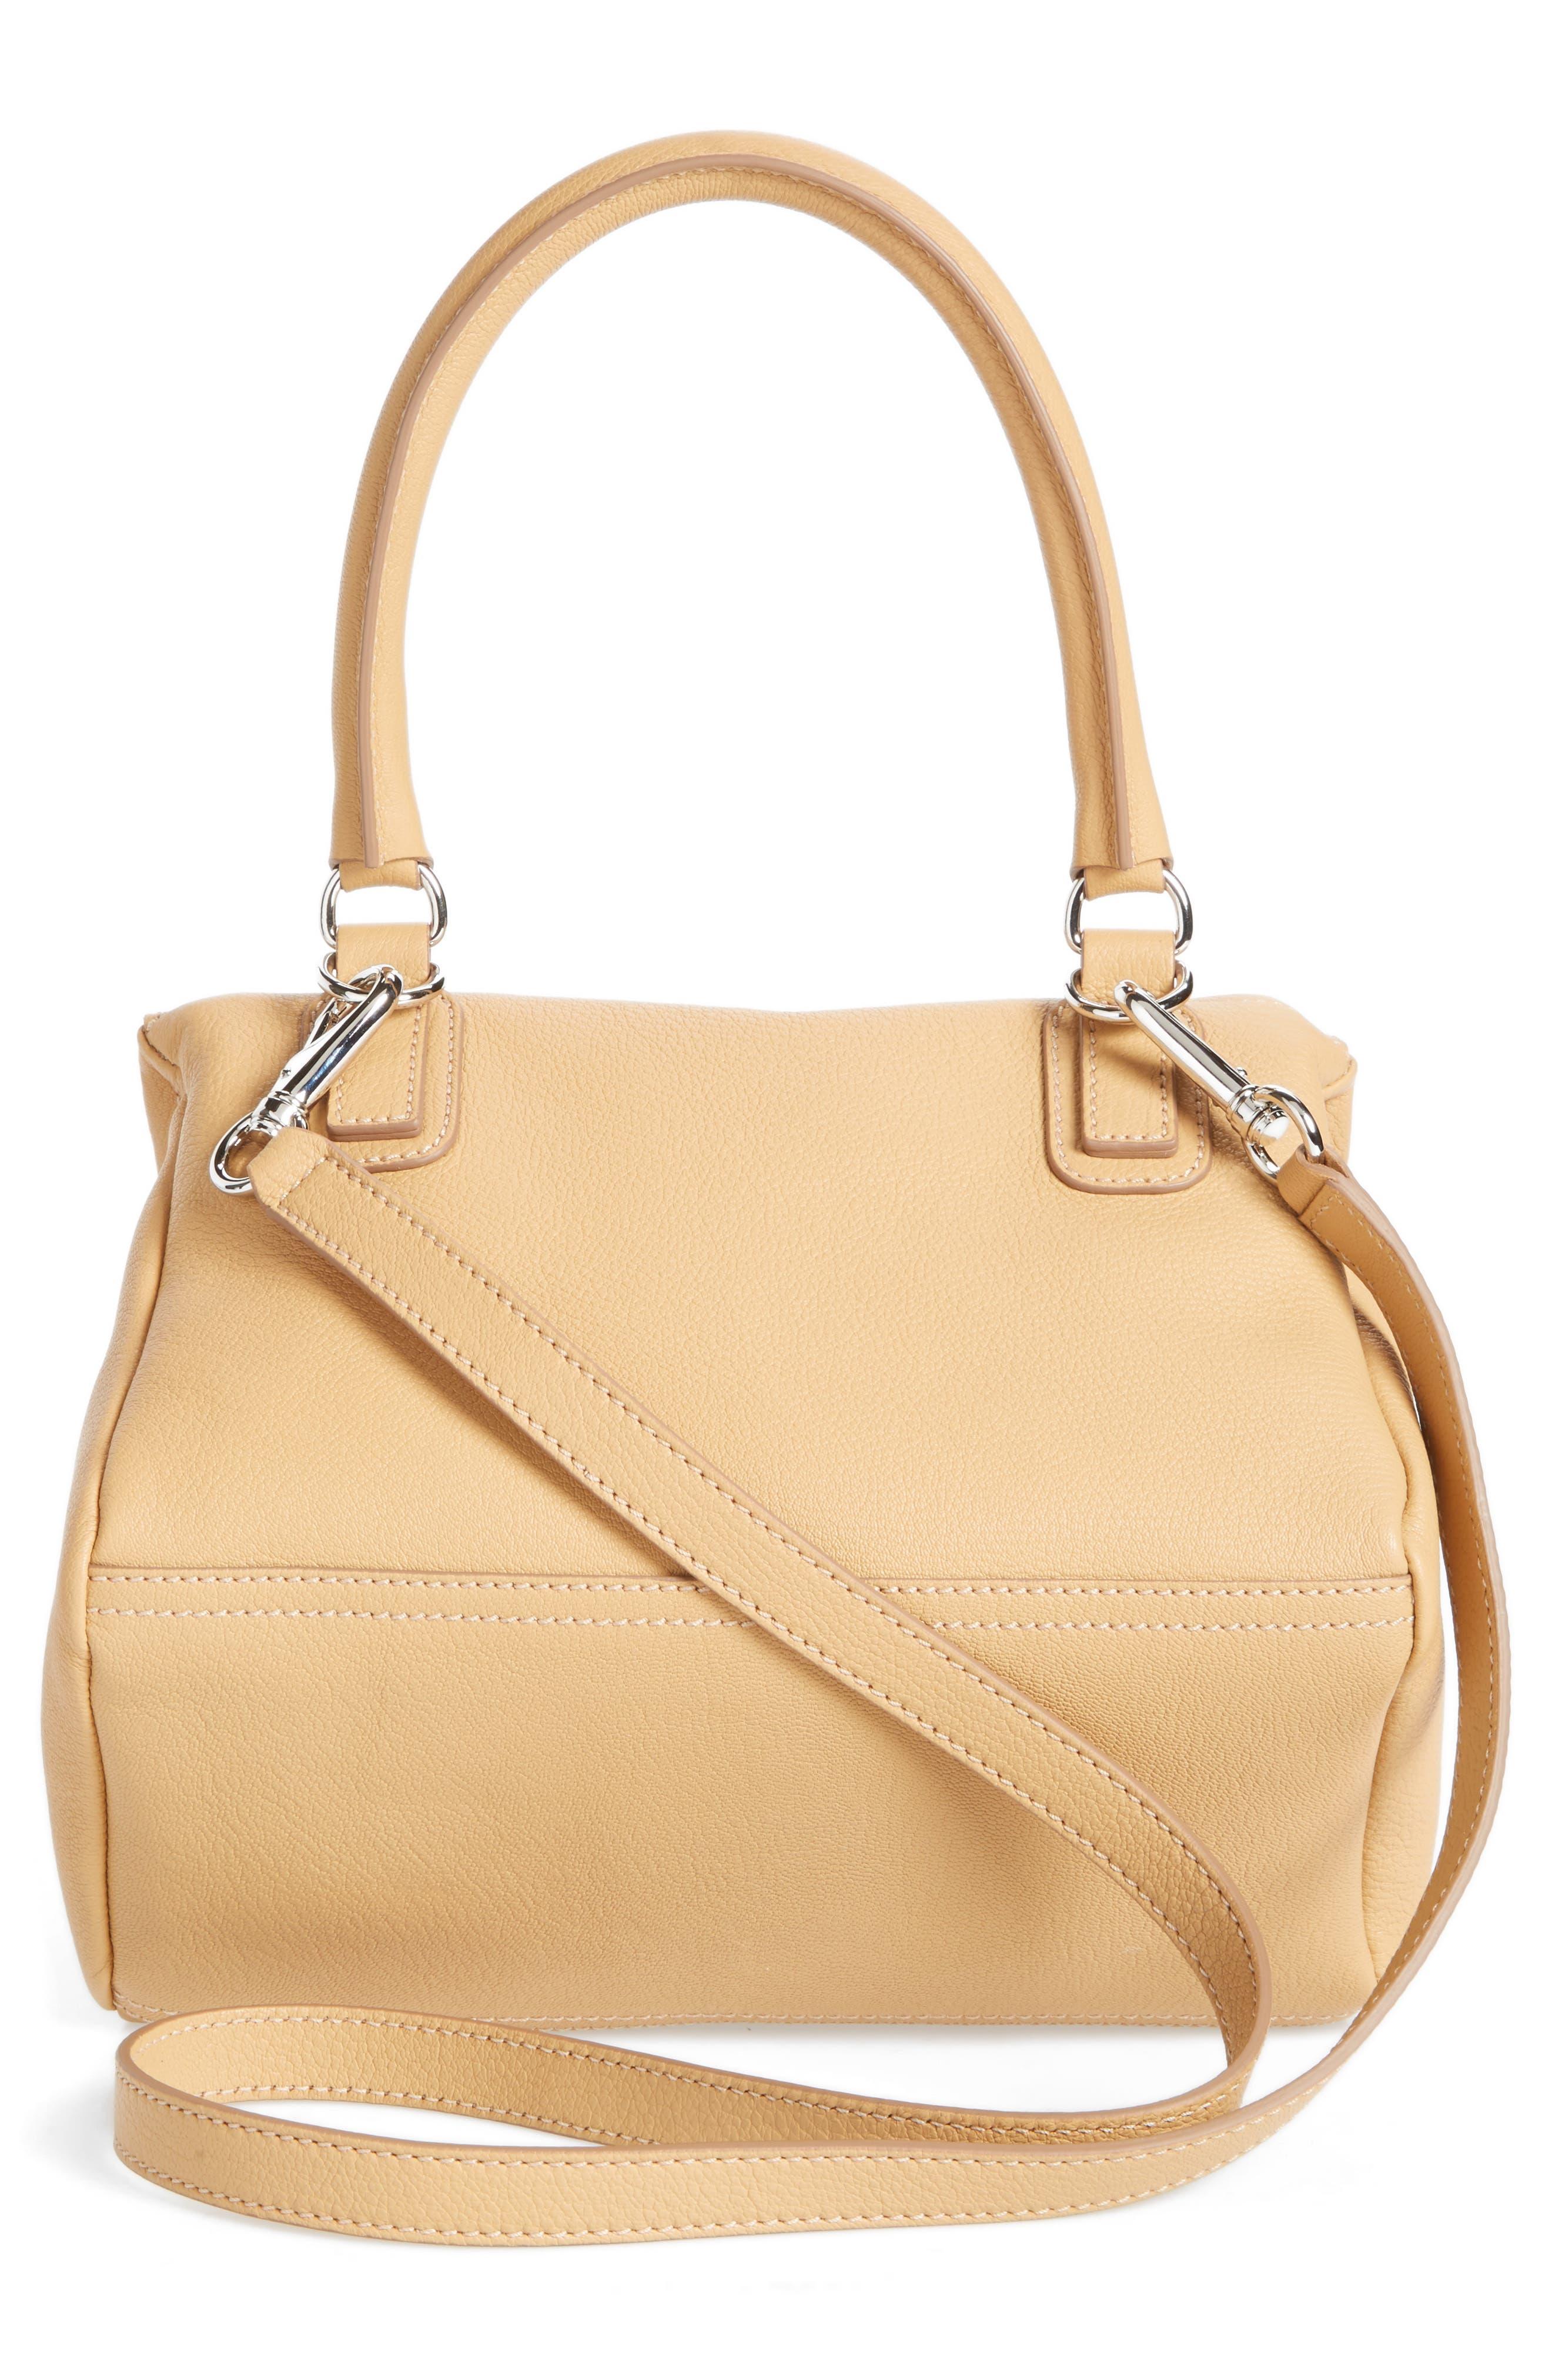 Alternate Image 3  - Givenchy 'Small Pandora' Leather Satchel